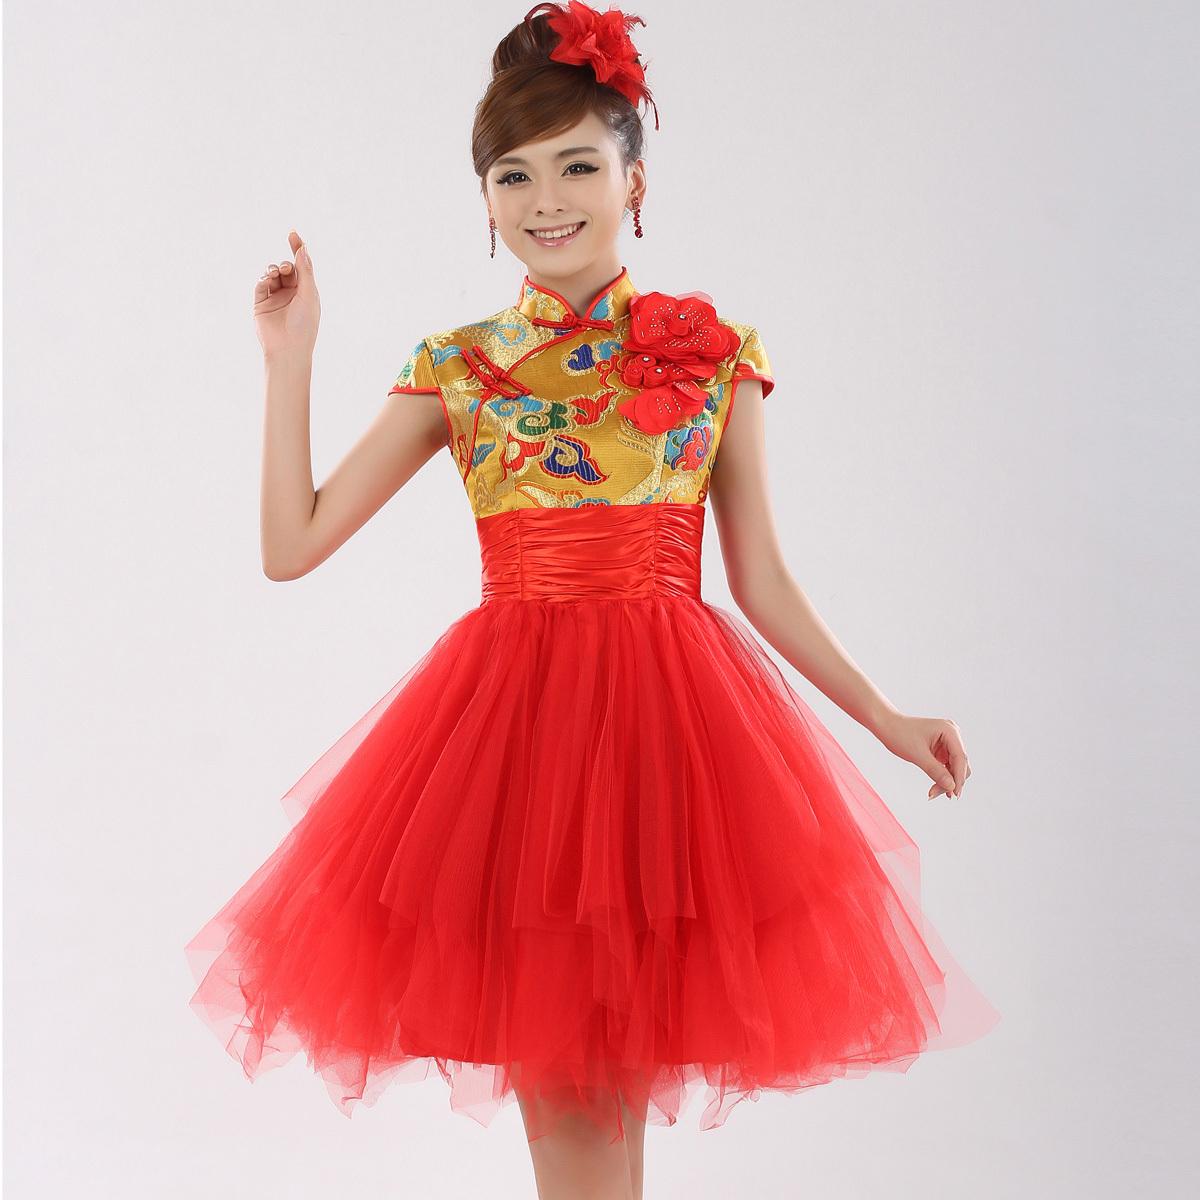 The bride gold robes red bride wedding dress cheongsam improved short